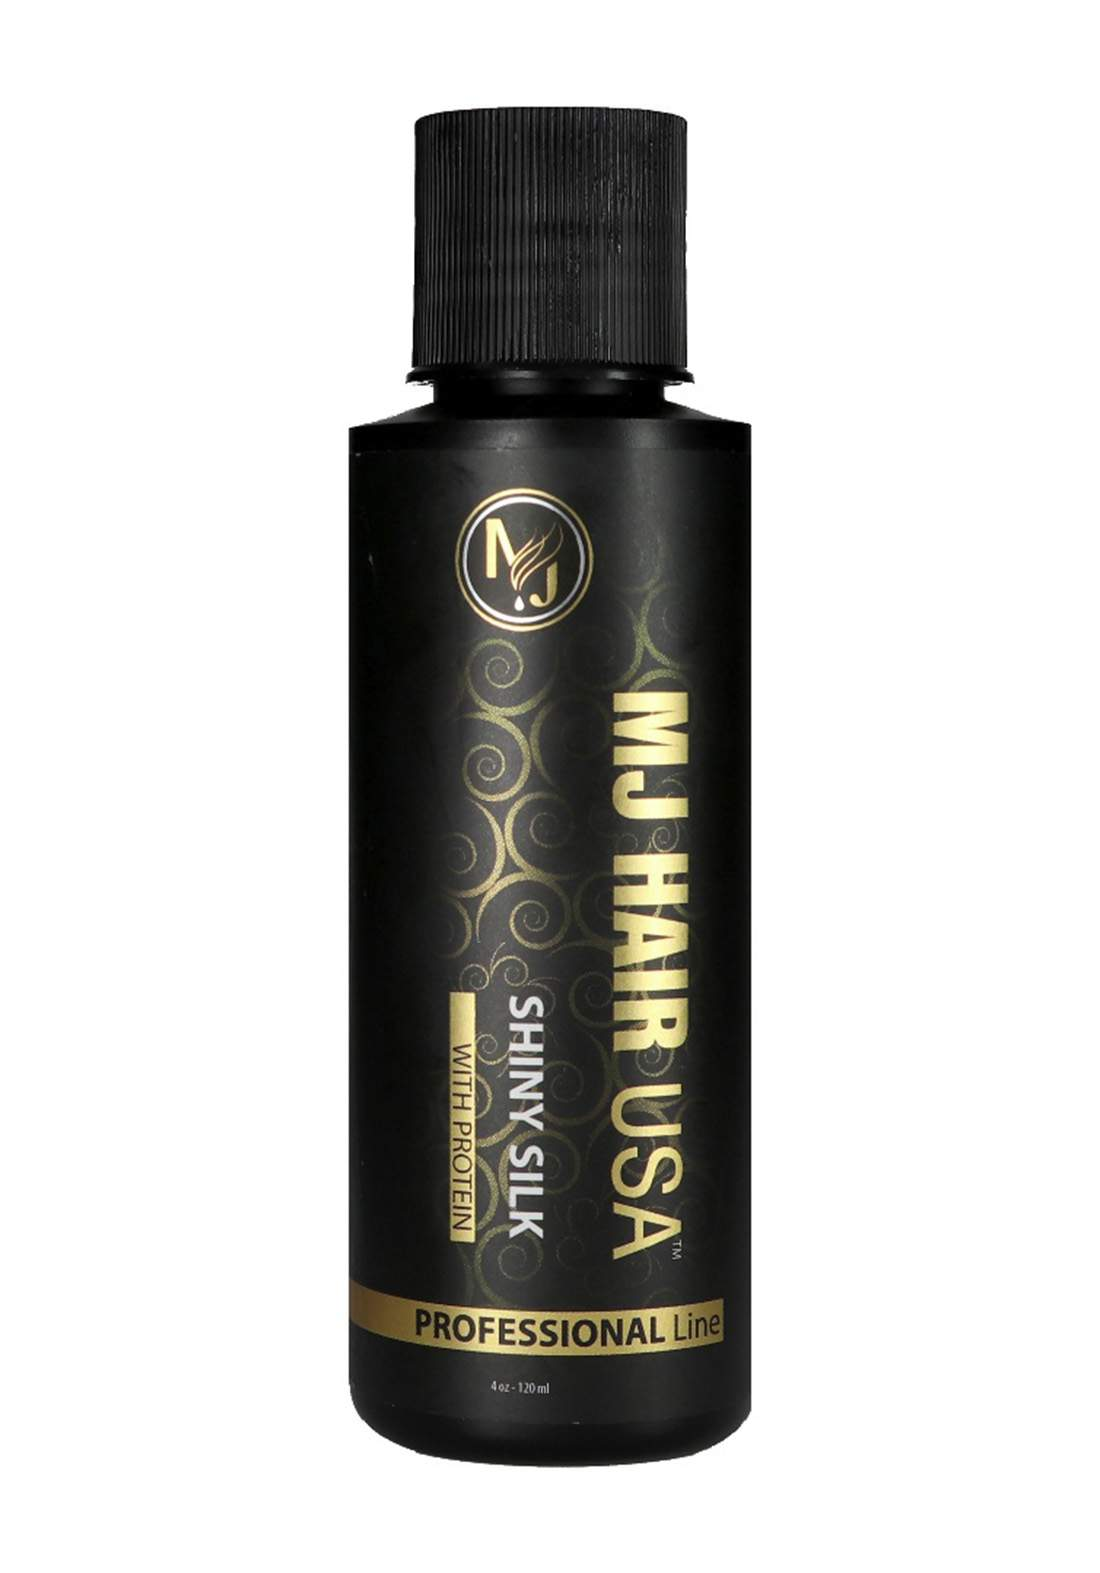 Mj Hair Shiny Silk Serum 120ml سيروم للشعر